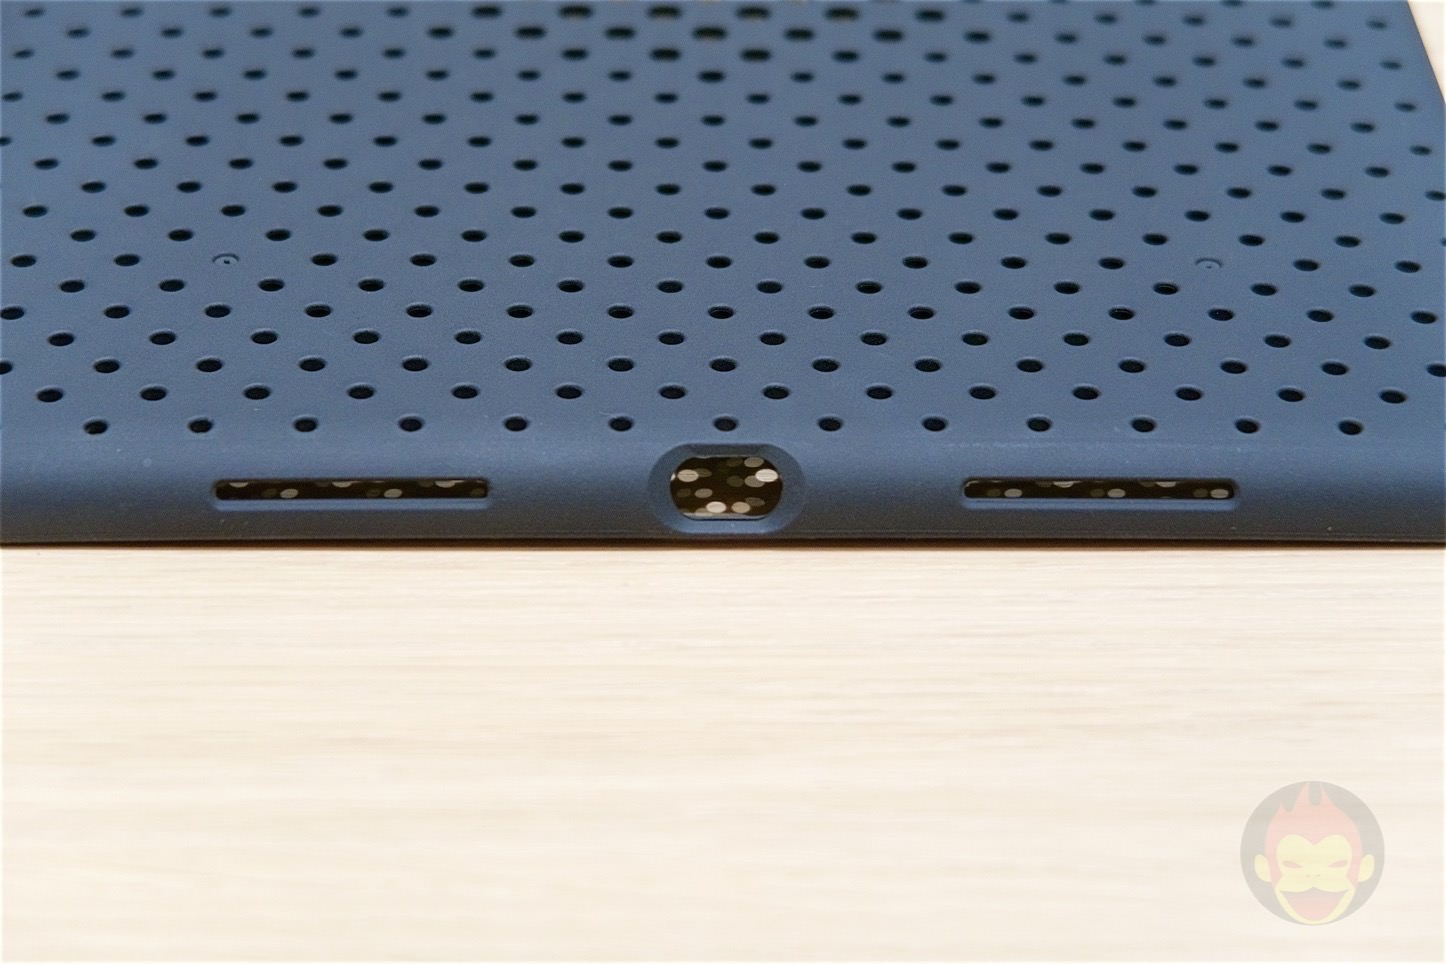 Andmesh-Mesh-Case-for-iPad-Pro-03.jpg